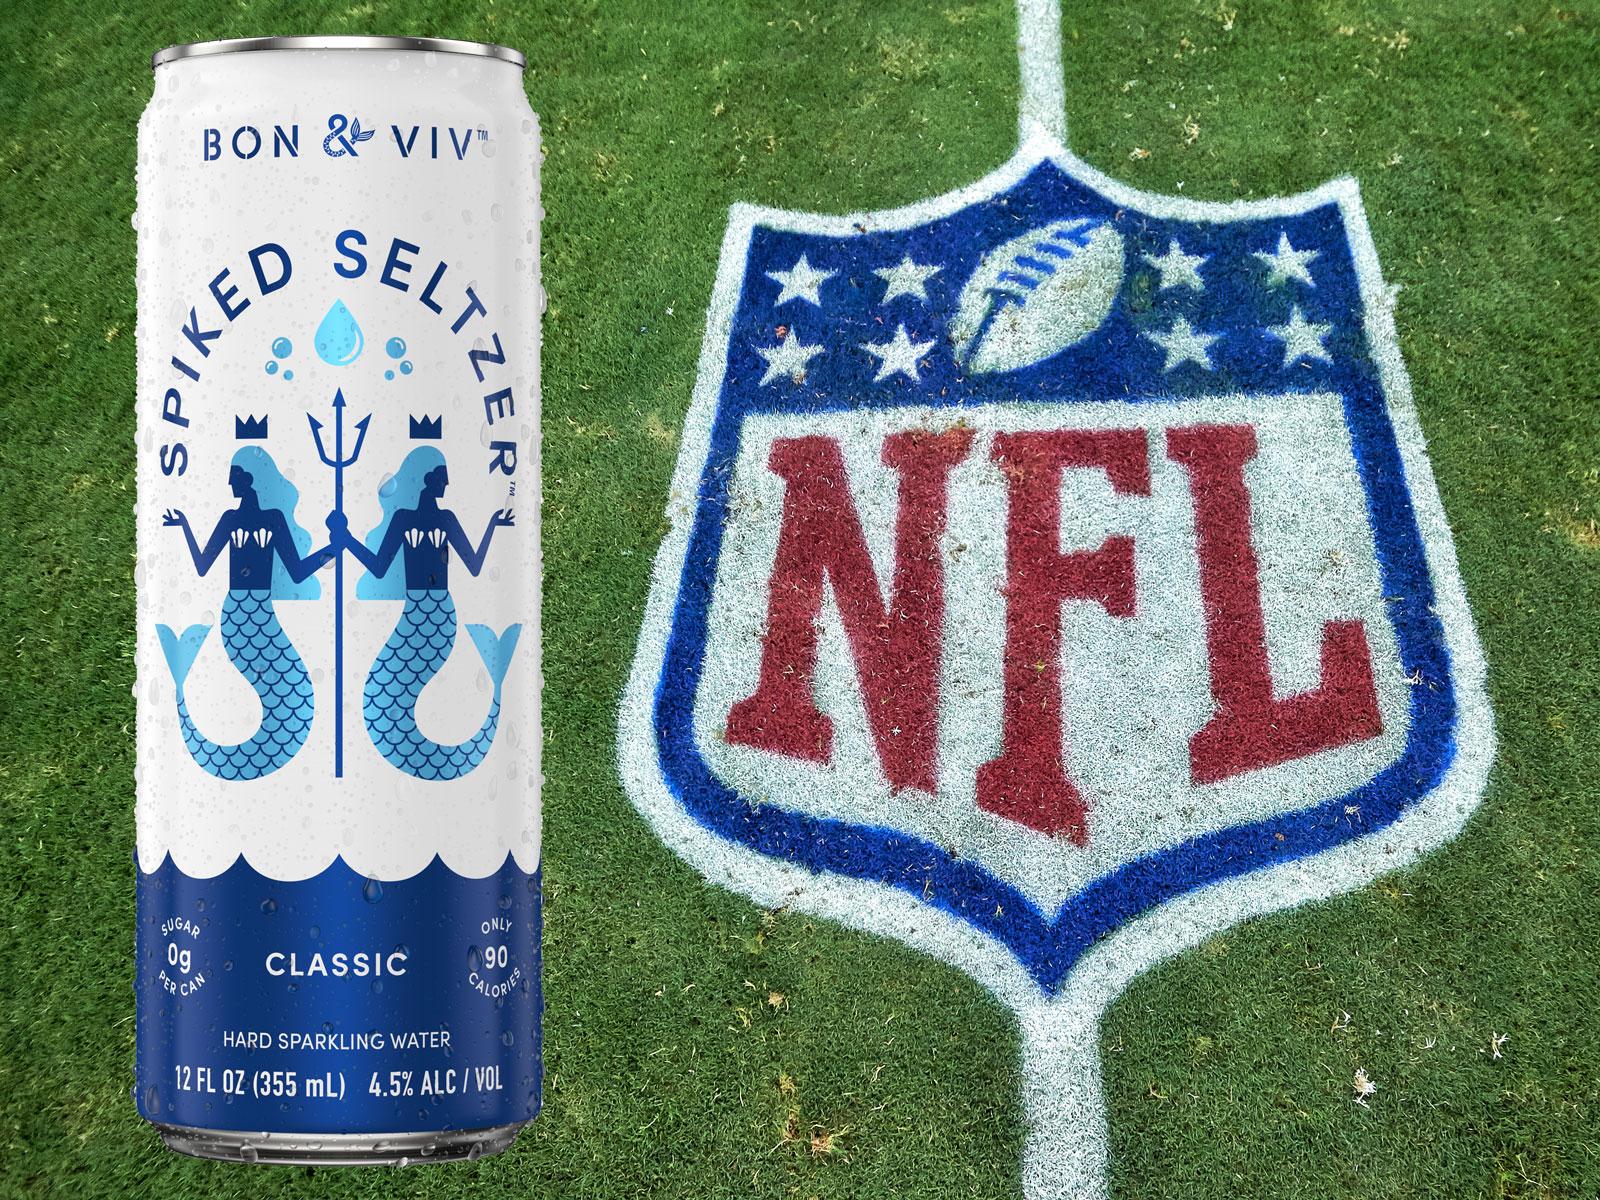 The NFL Has an 'Official Hard Seltzer'